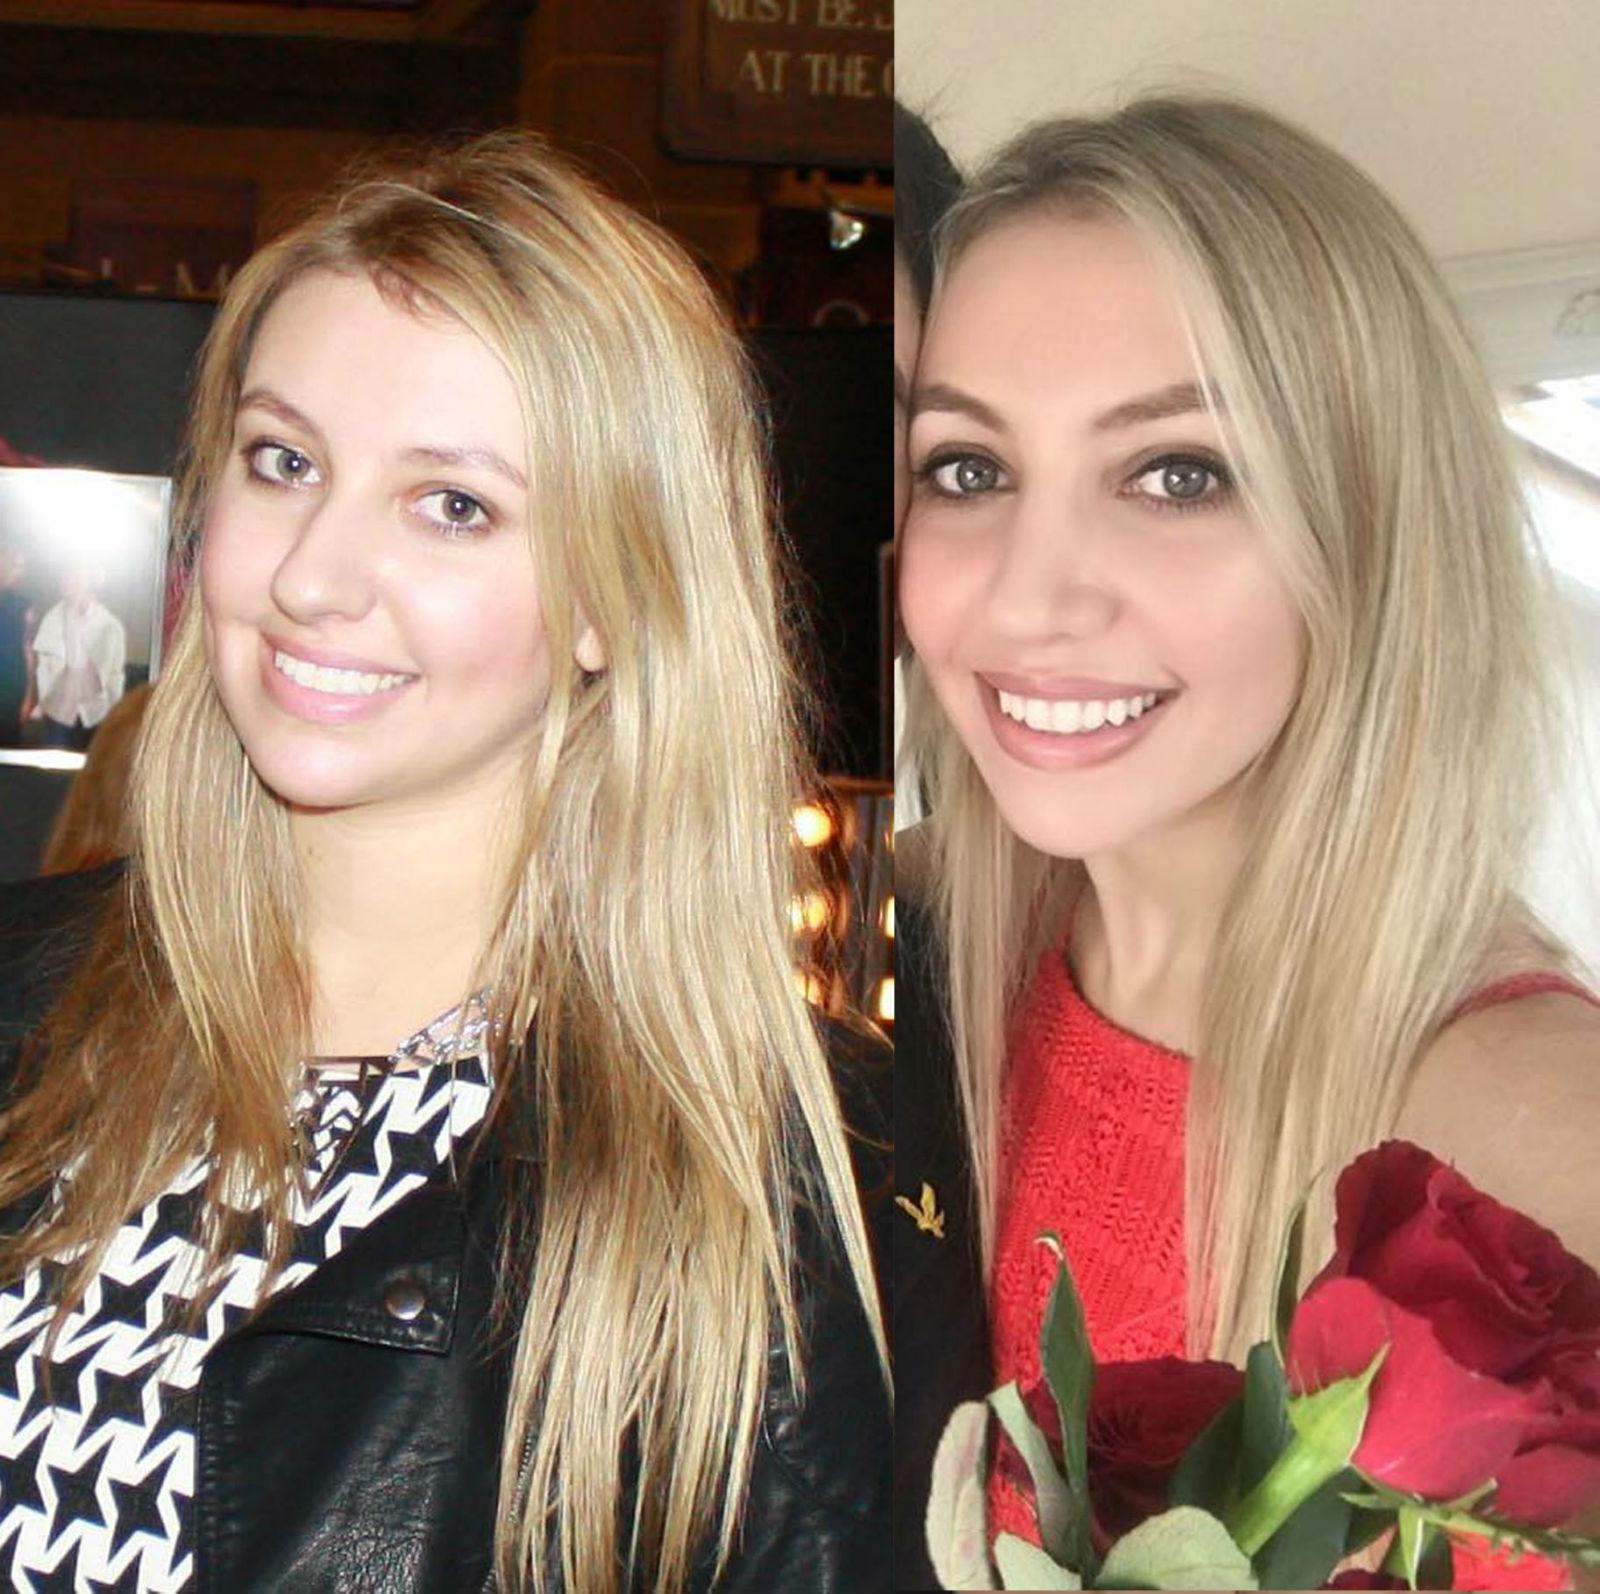 My Nose Job Story - Scarlett London - A London Lifestyle Blog